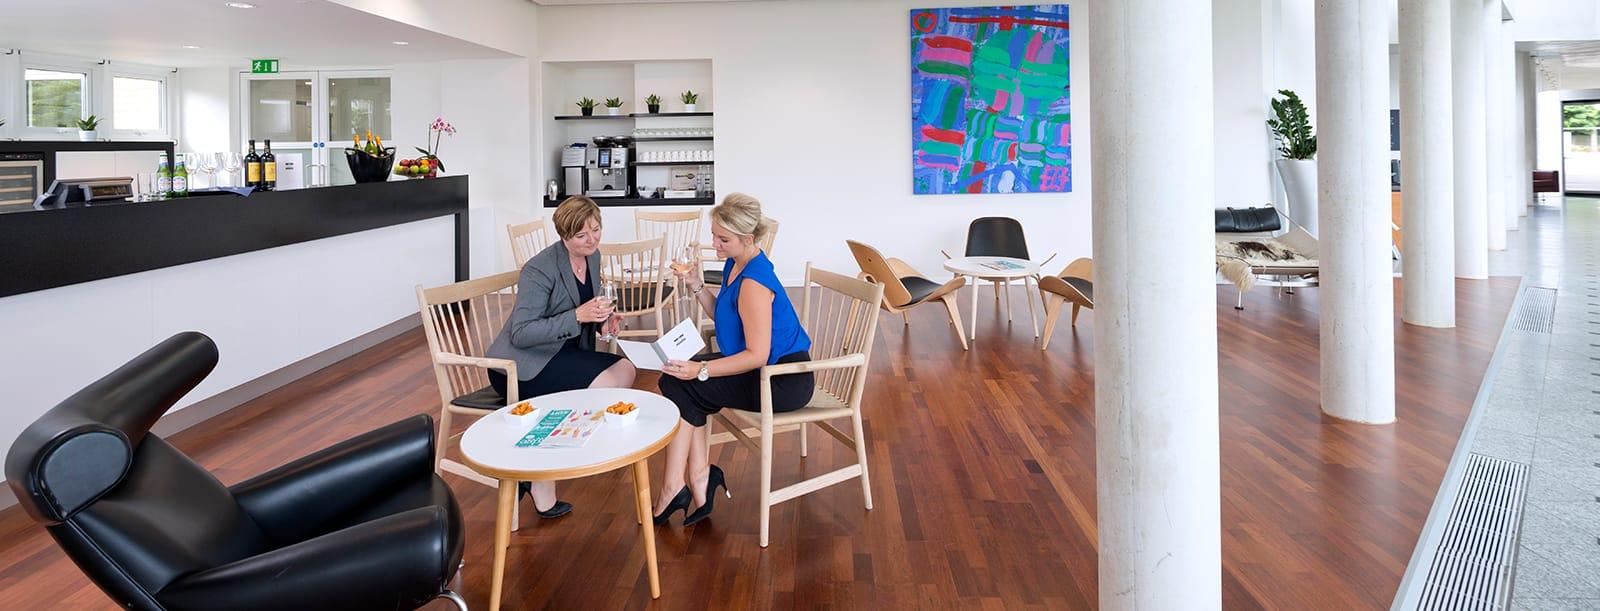 Meeting in the Hans J Wegner Lounge